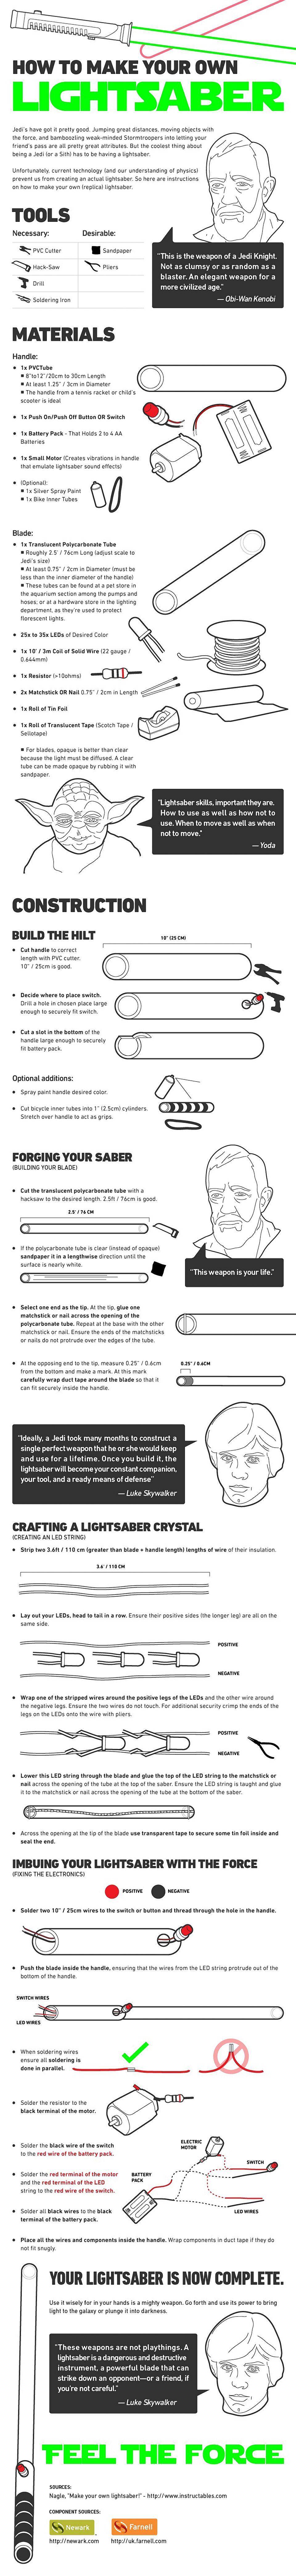 Make Your Own Lightsaber Diy Instructions Lightsaber Star Wars Light Saber Make A Lightsaber